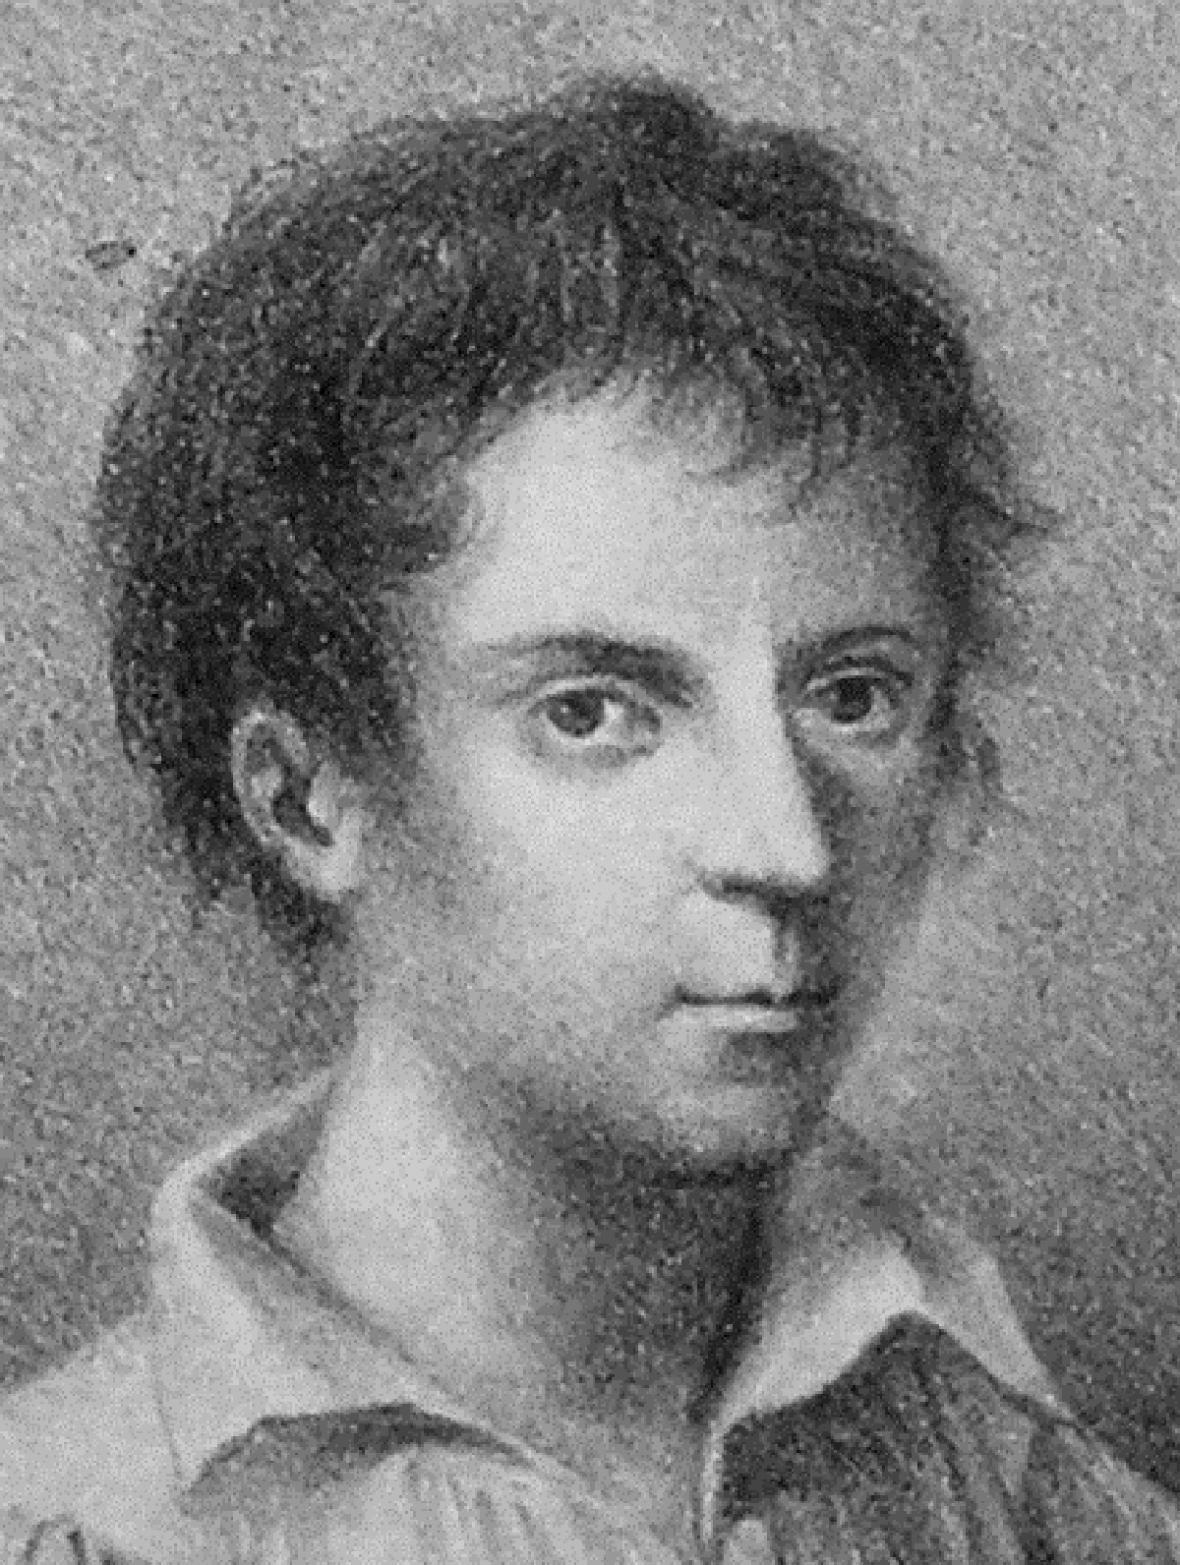 Johann Georg Grasel